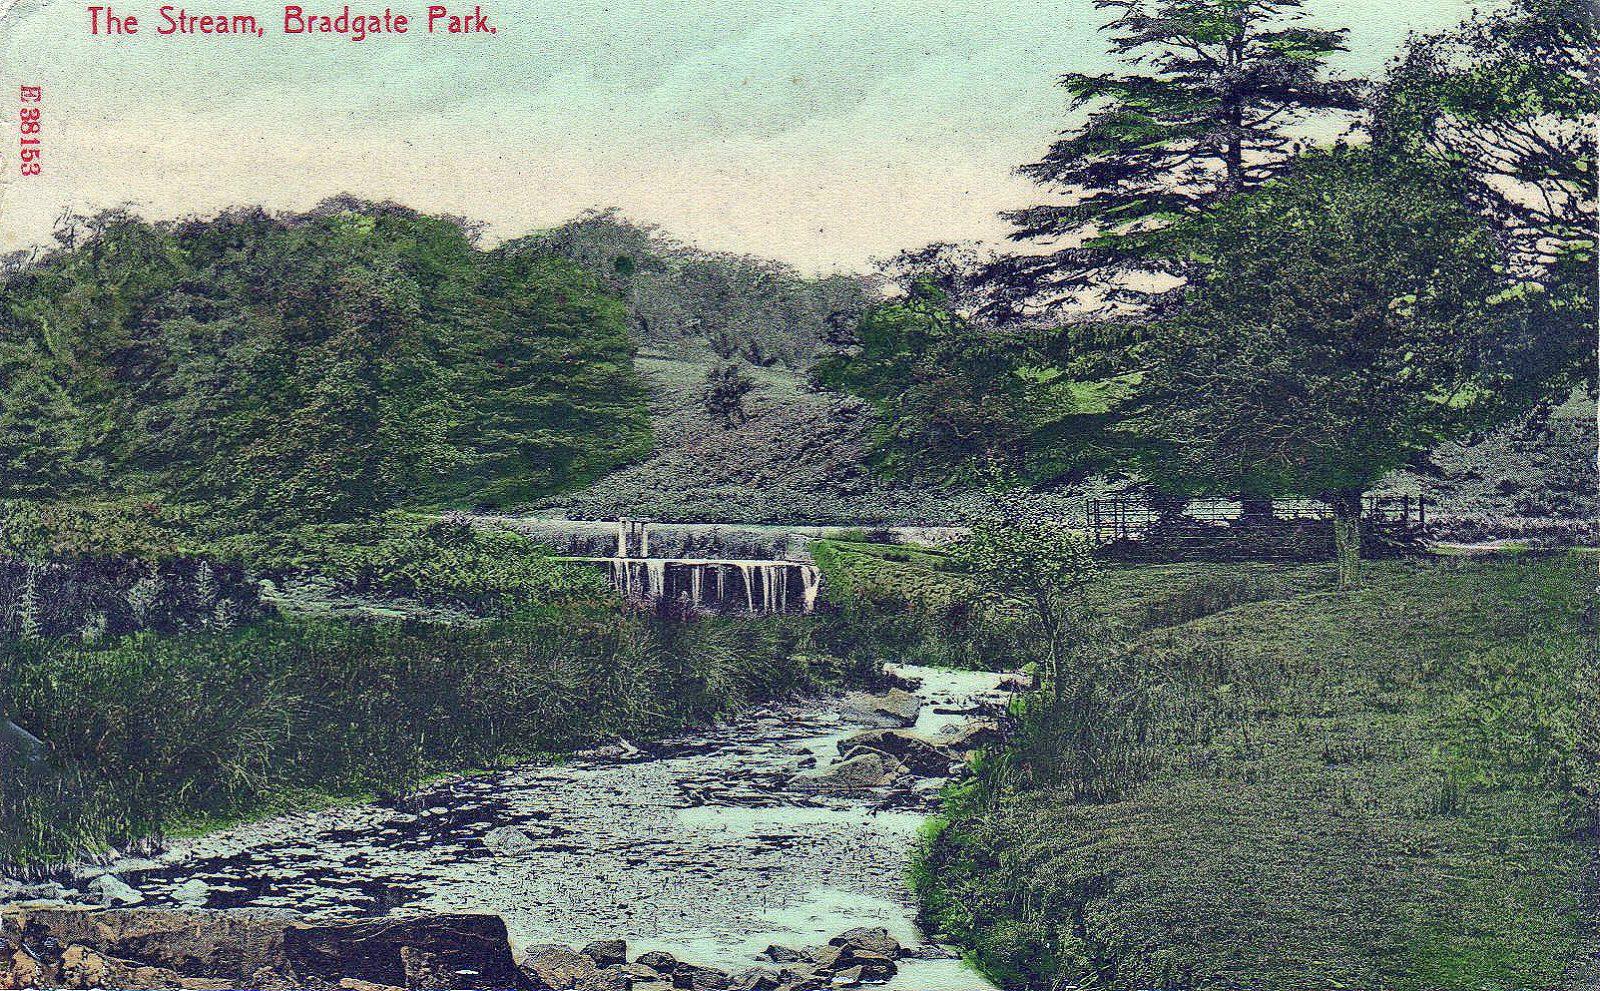 Bradgate Park, Leicester. 1901-1920: The stream and cascade (File:1533)